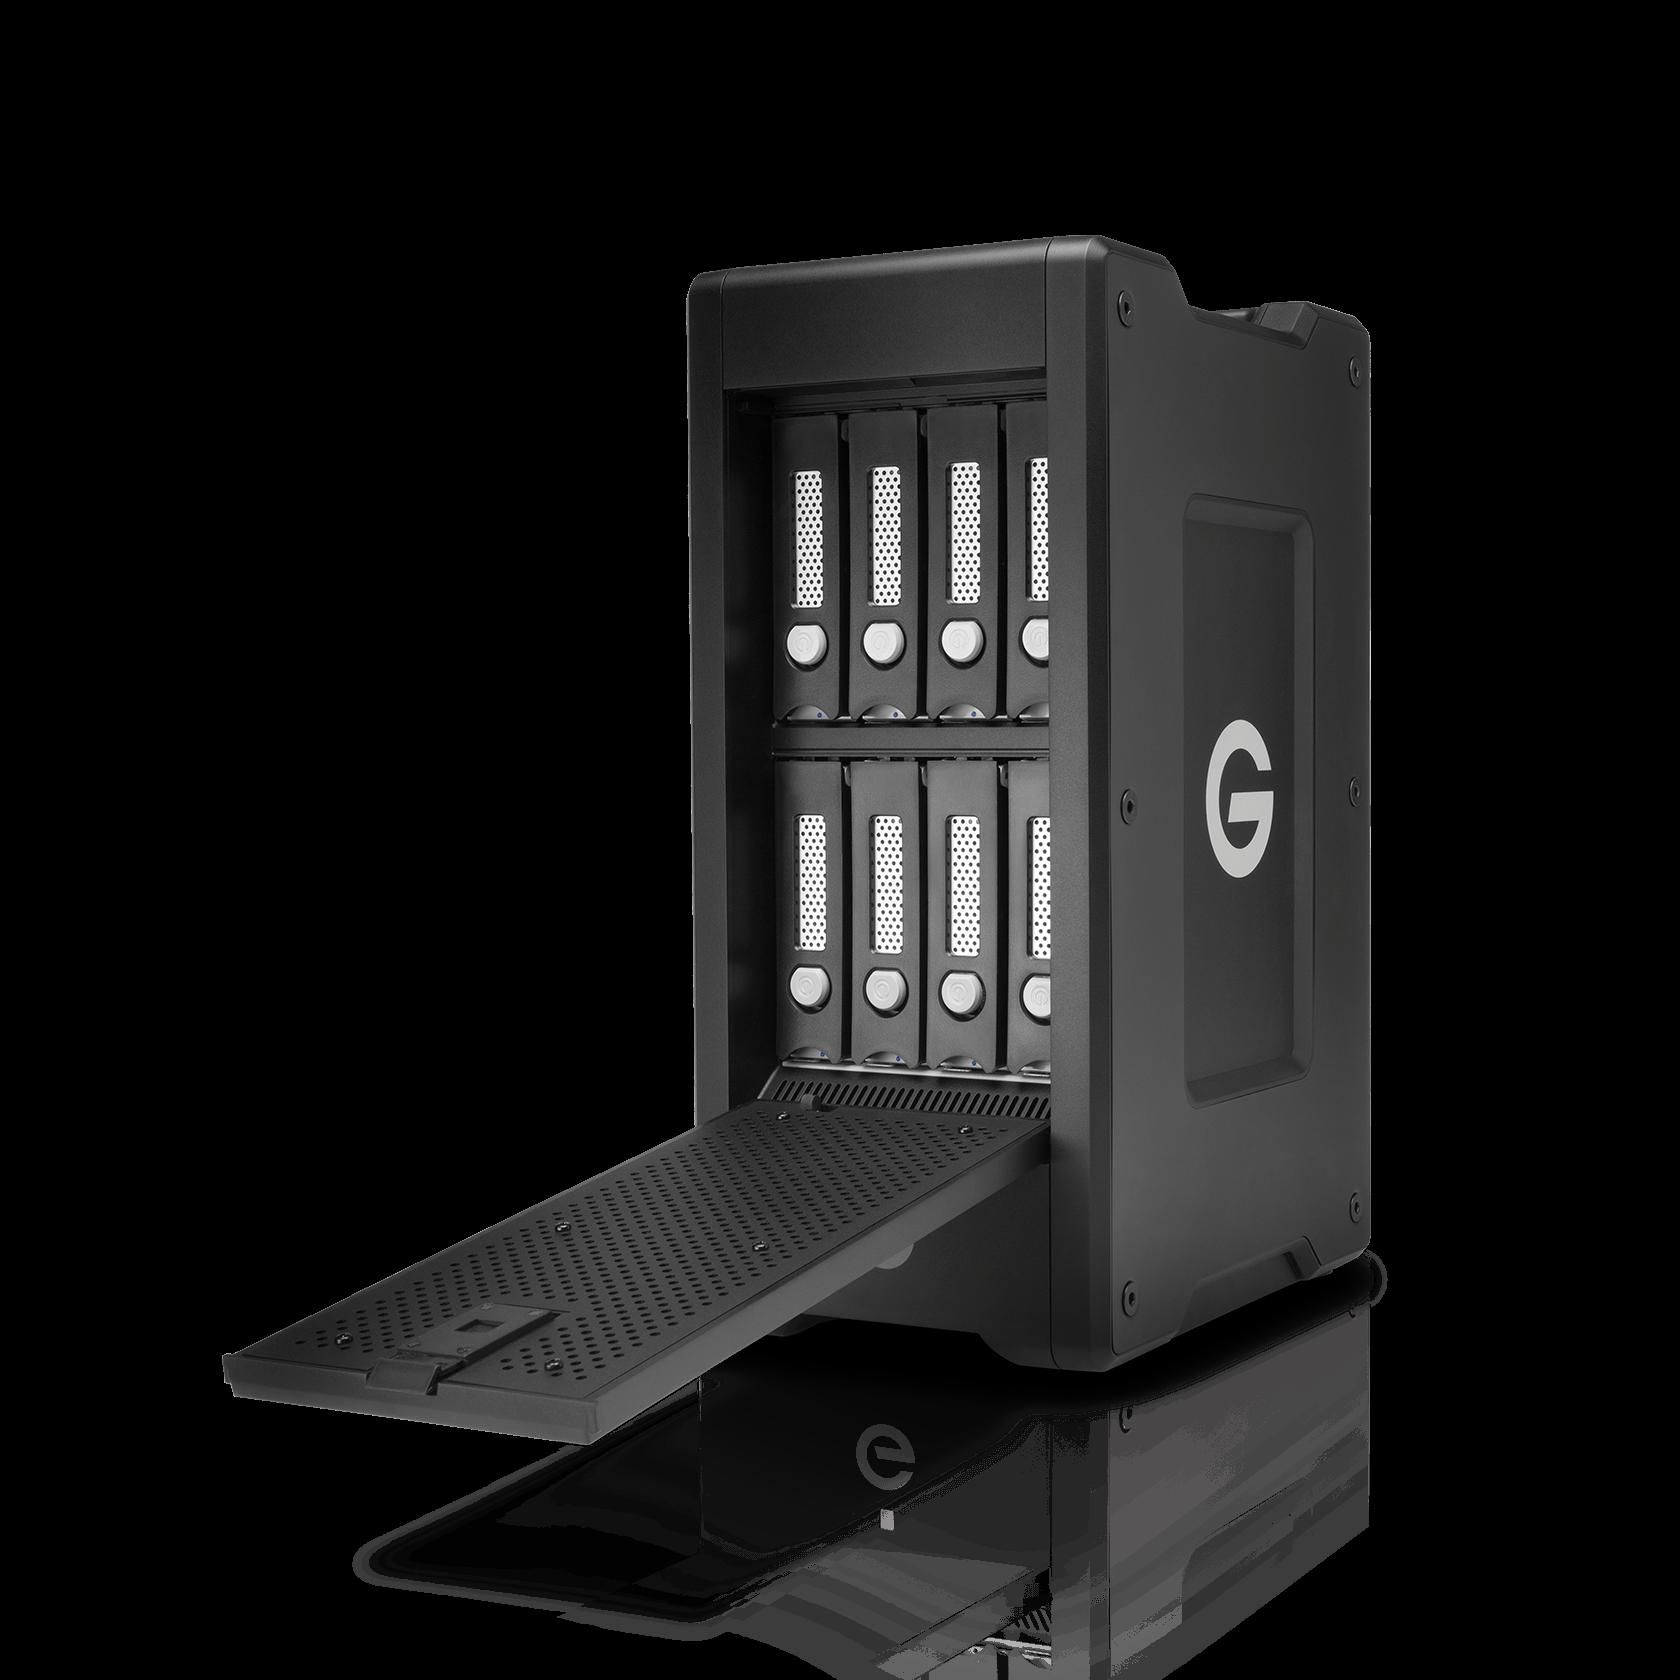 WesternDigital coupon: G-Technology 32TB G-SPEED Shuttle XL Thunderbolt 3, 8-bay Storage System - 0G05849